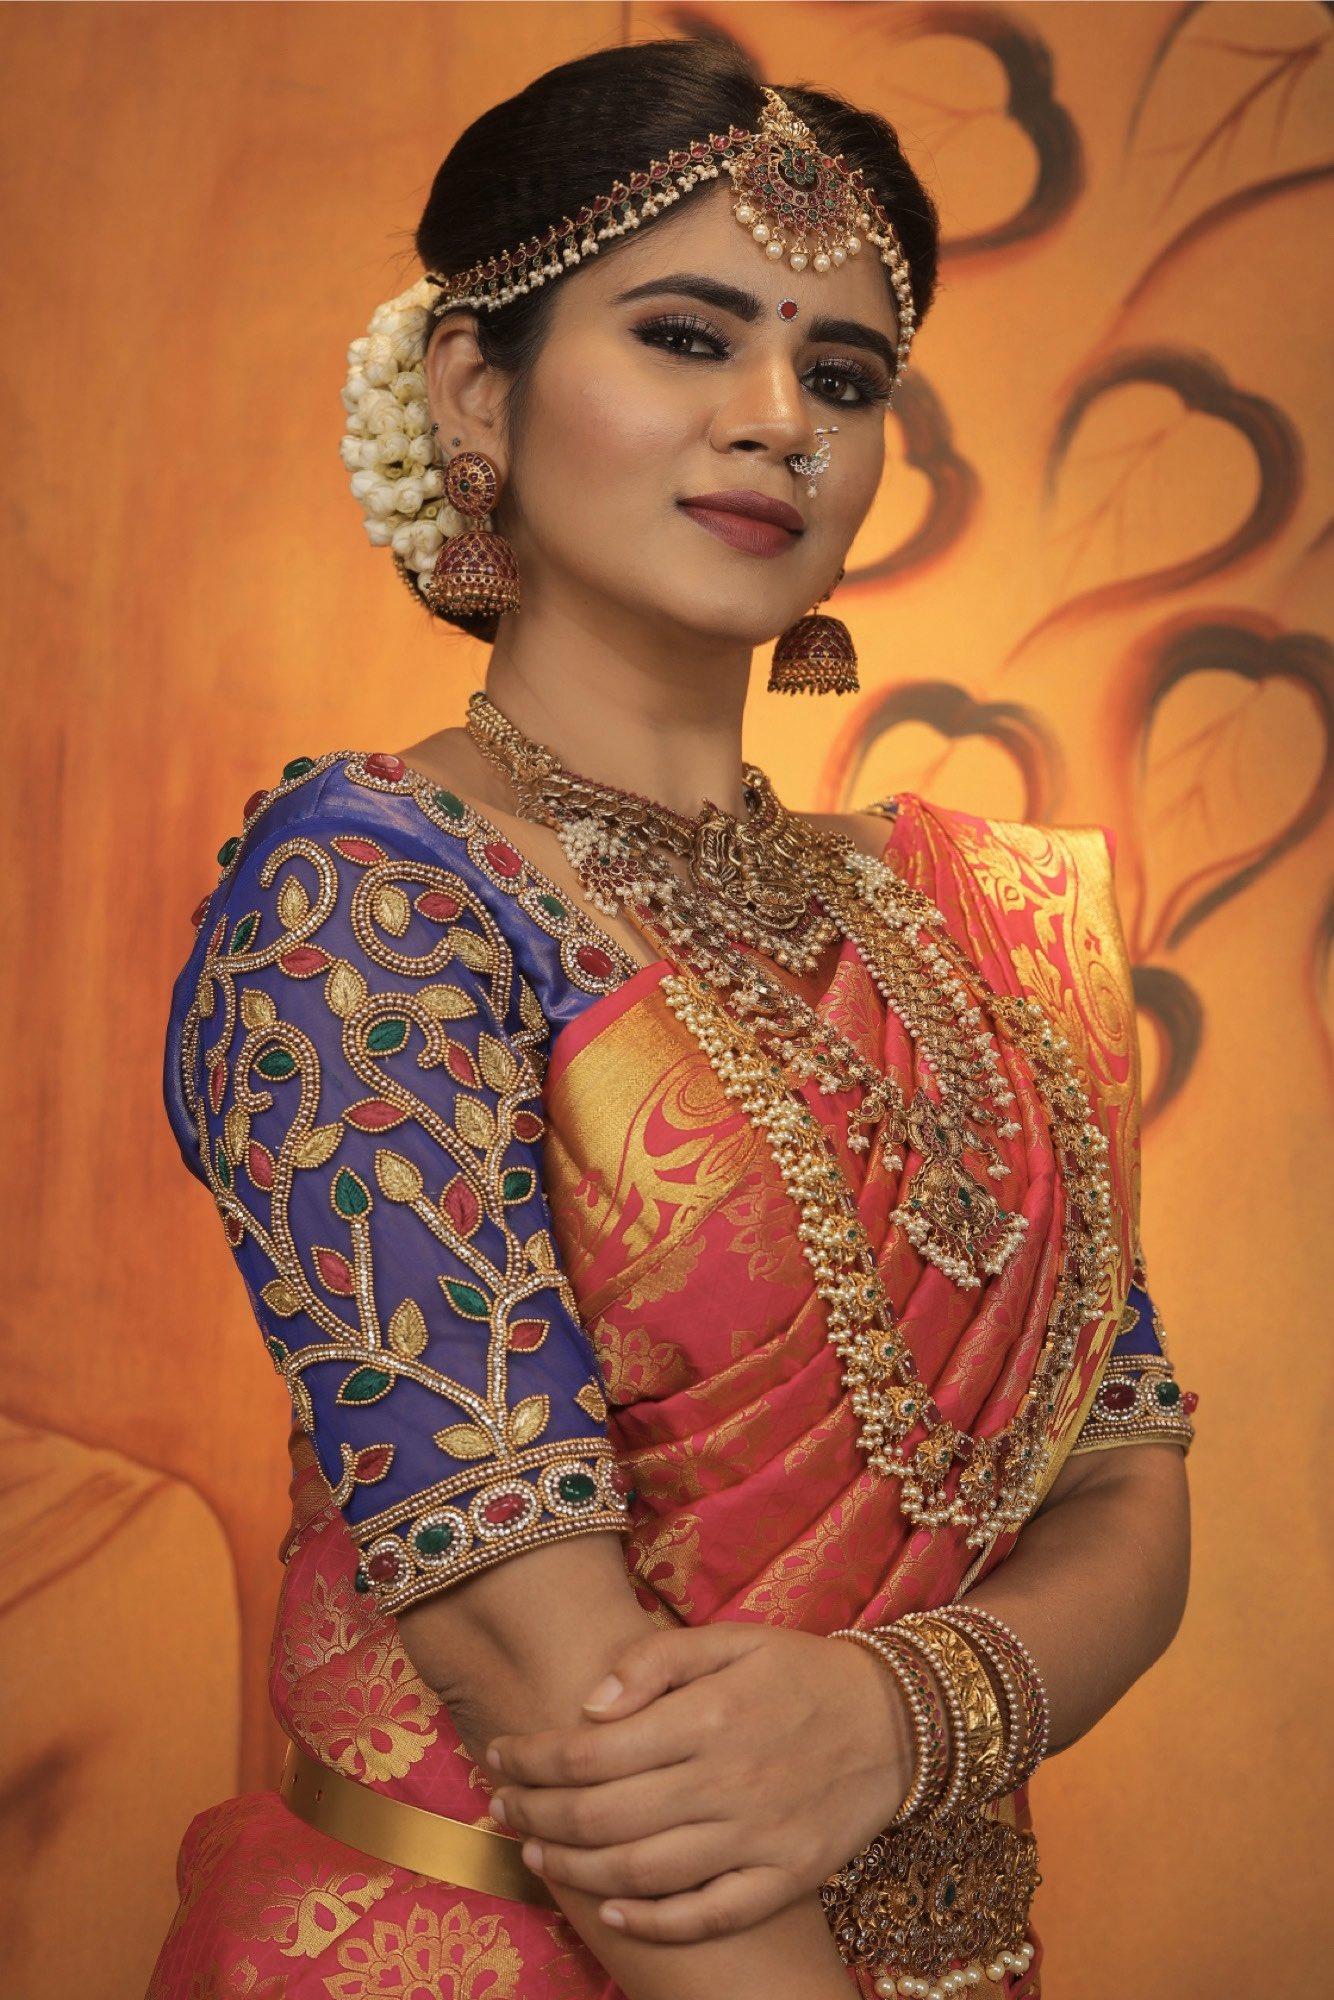 Soundariya-Nanjundan-Images